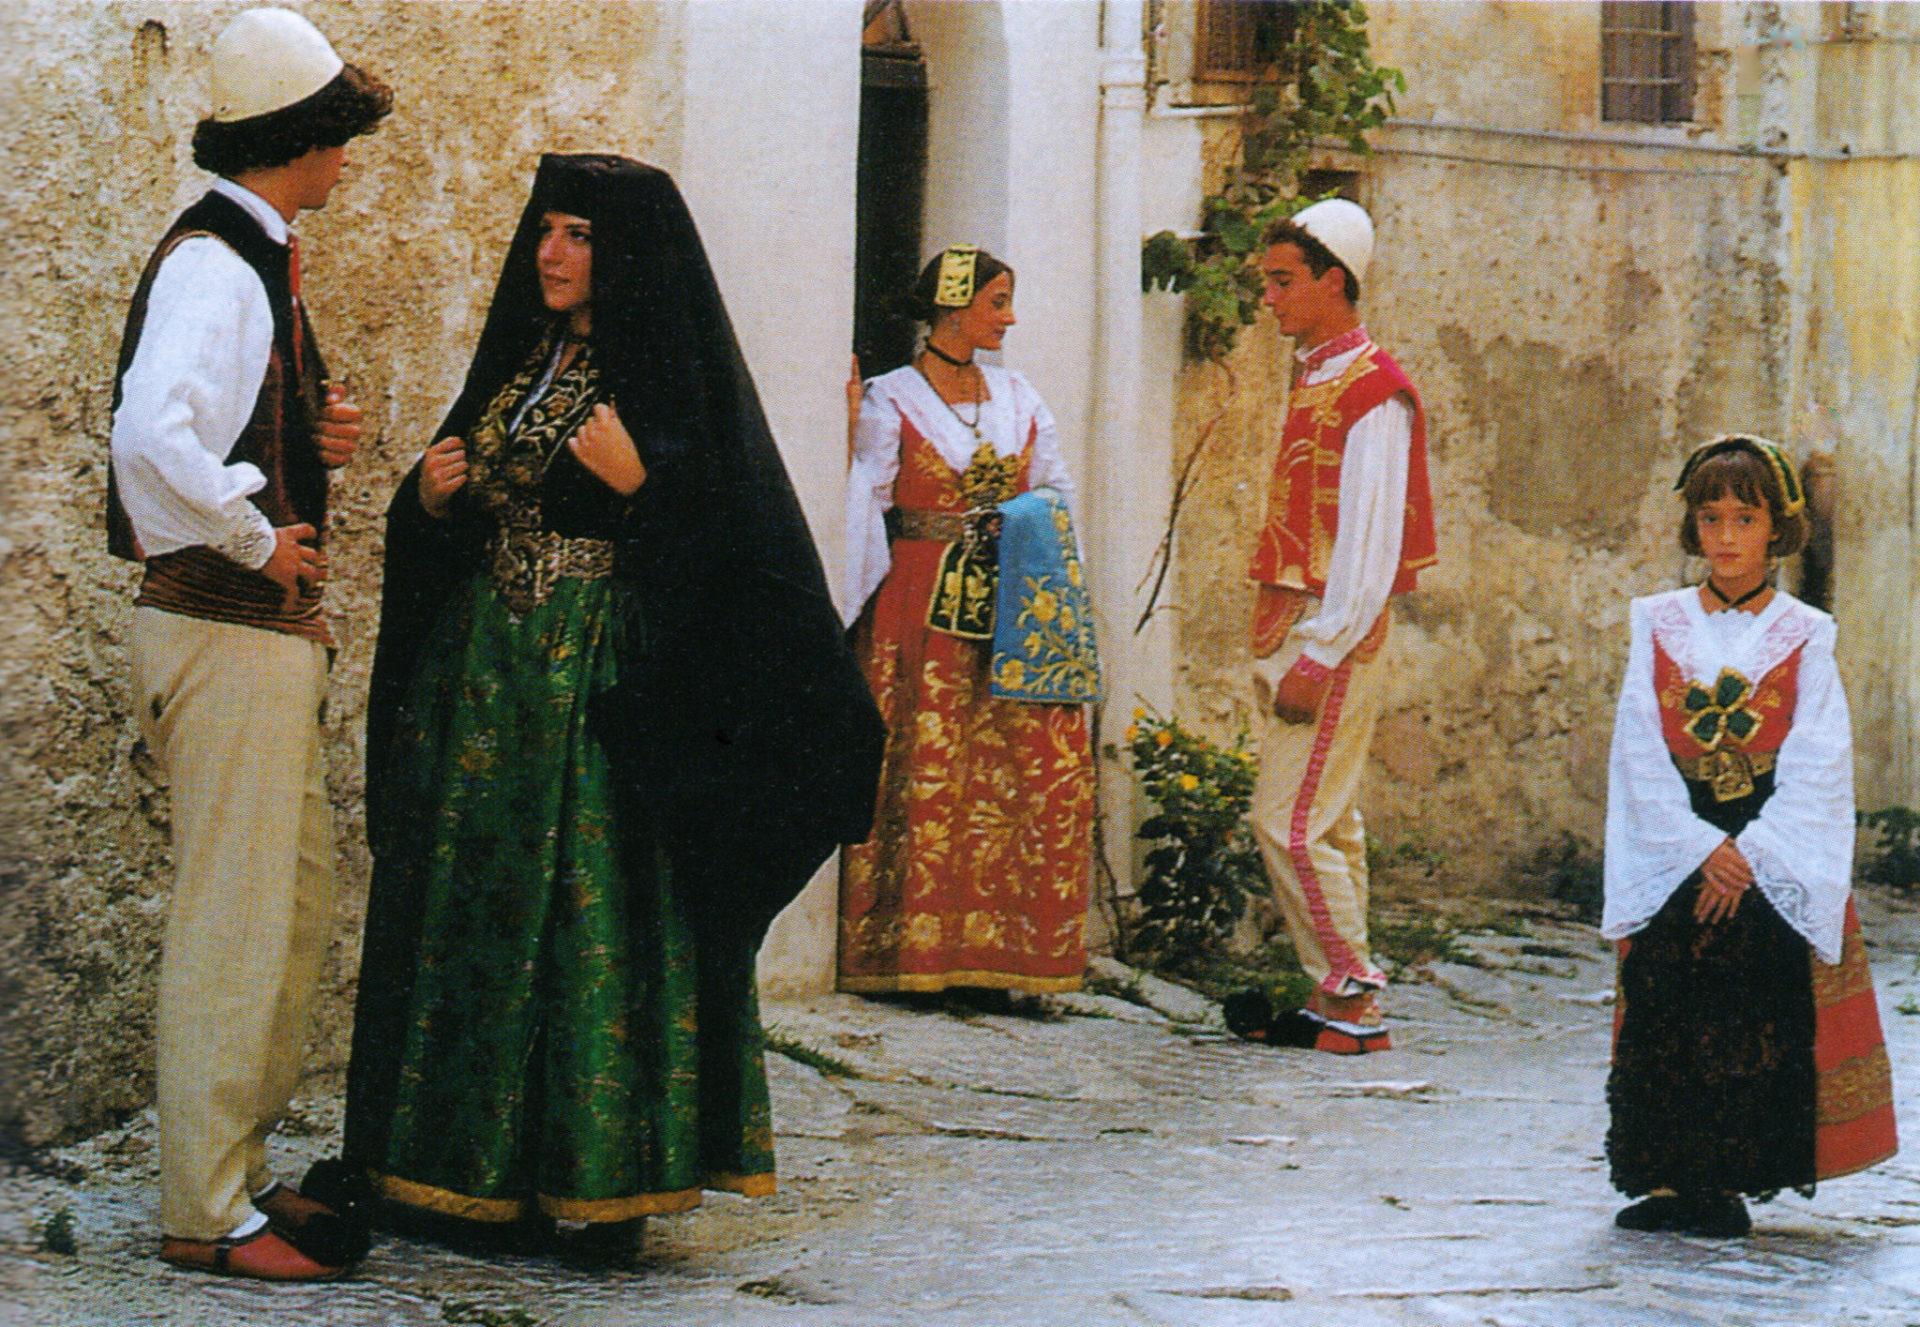 Tipologie_costume_Piana_degli_Albanesi